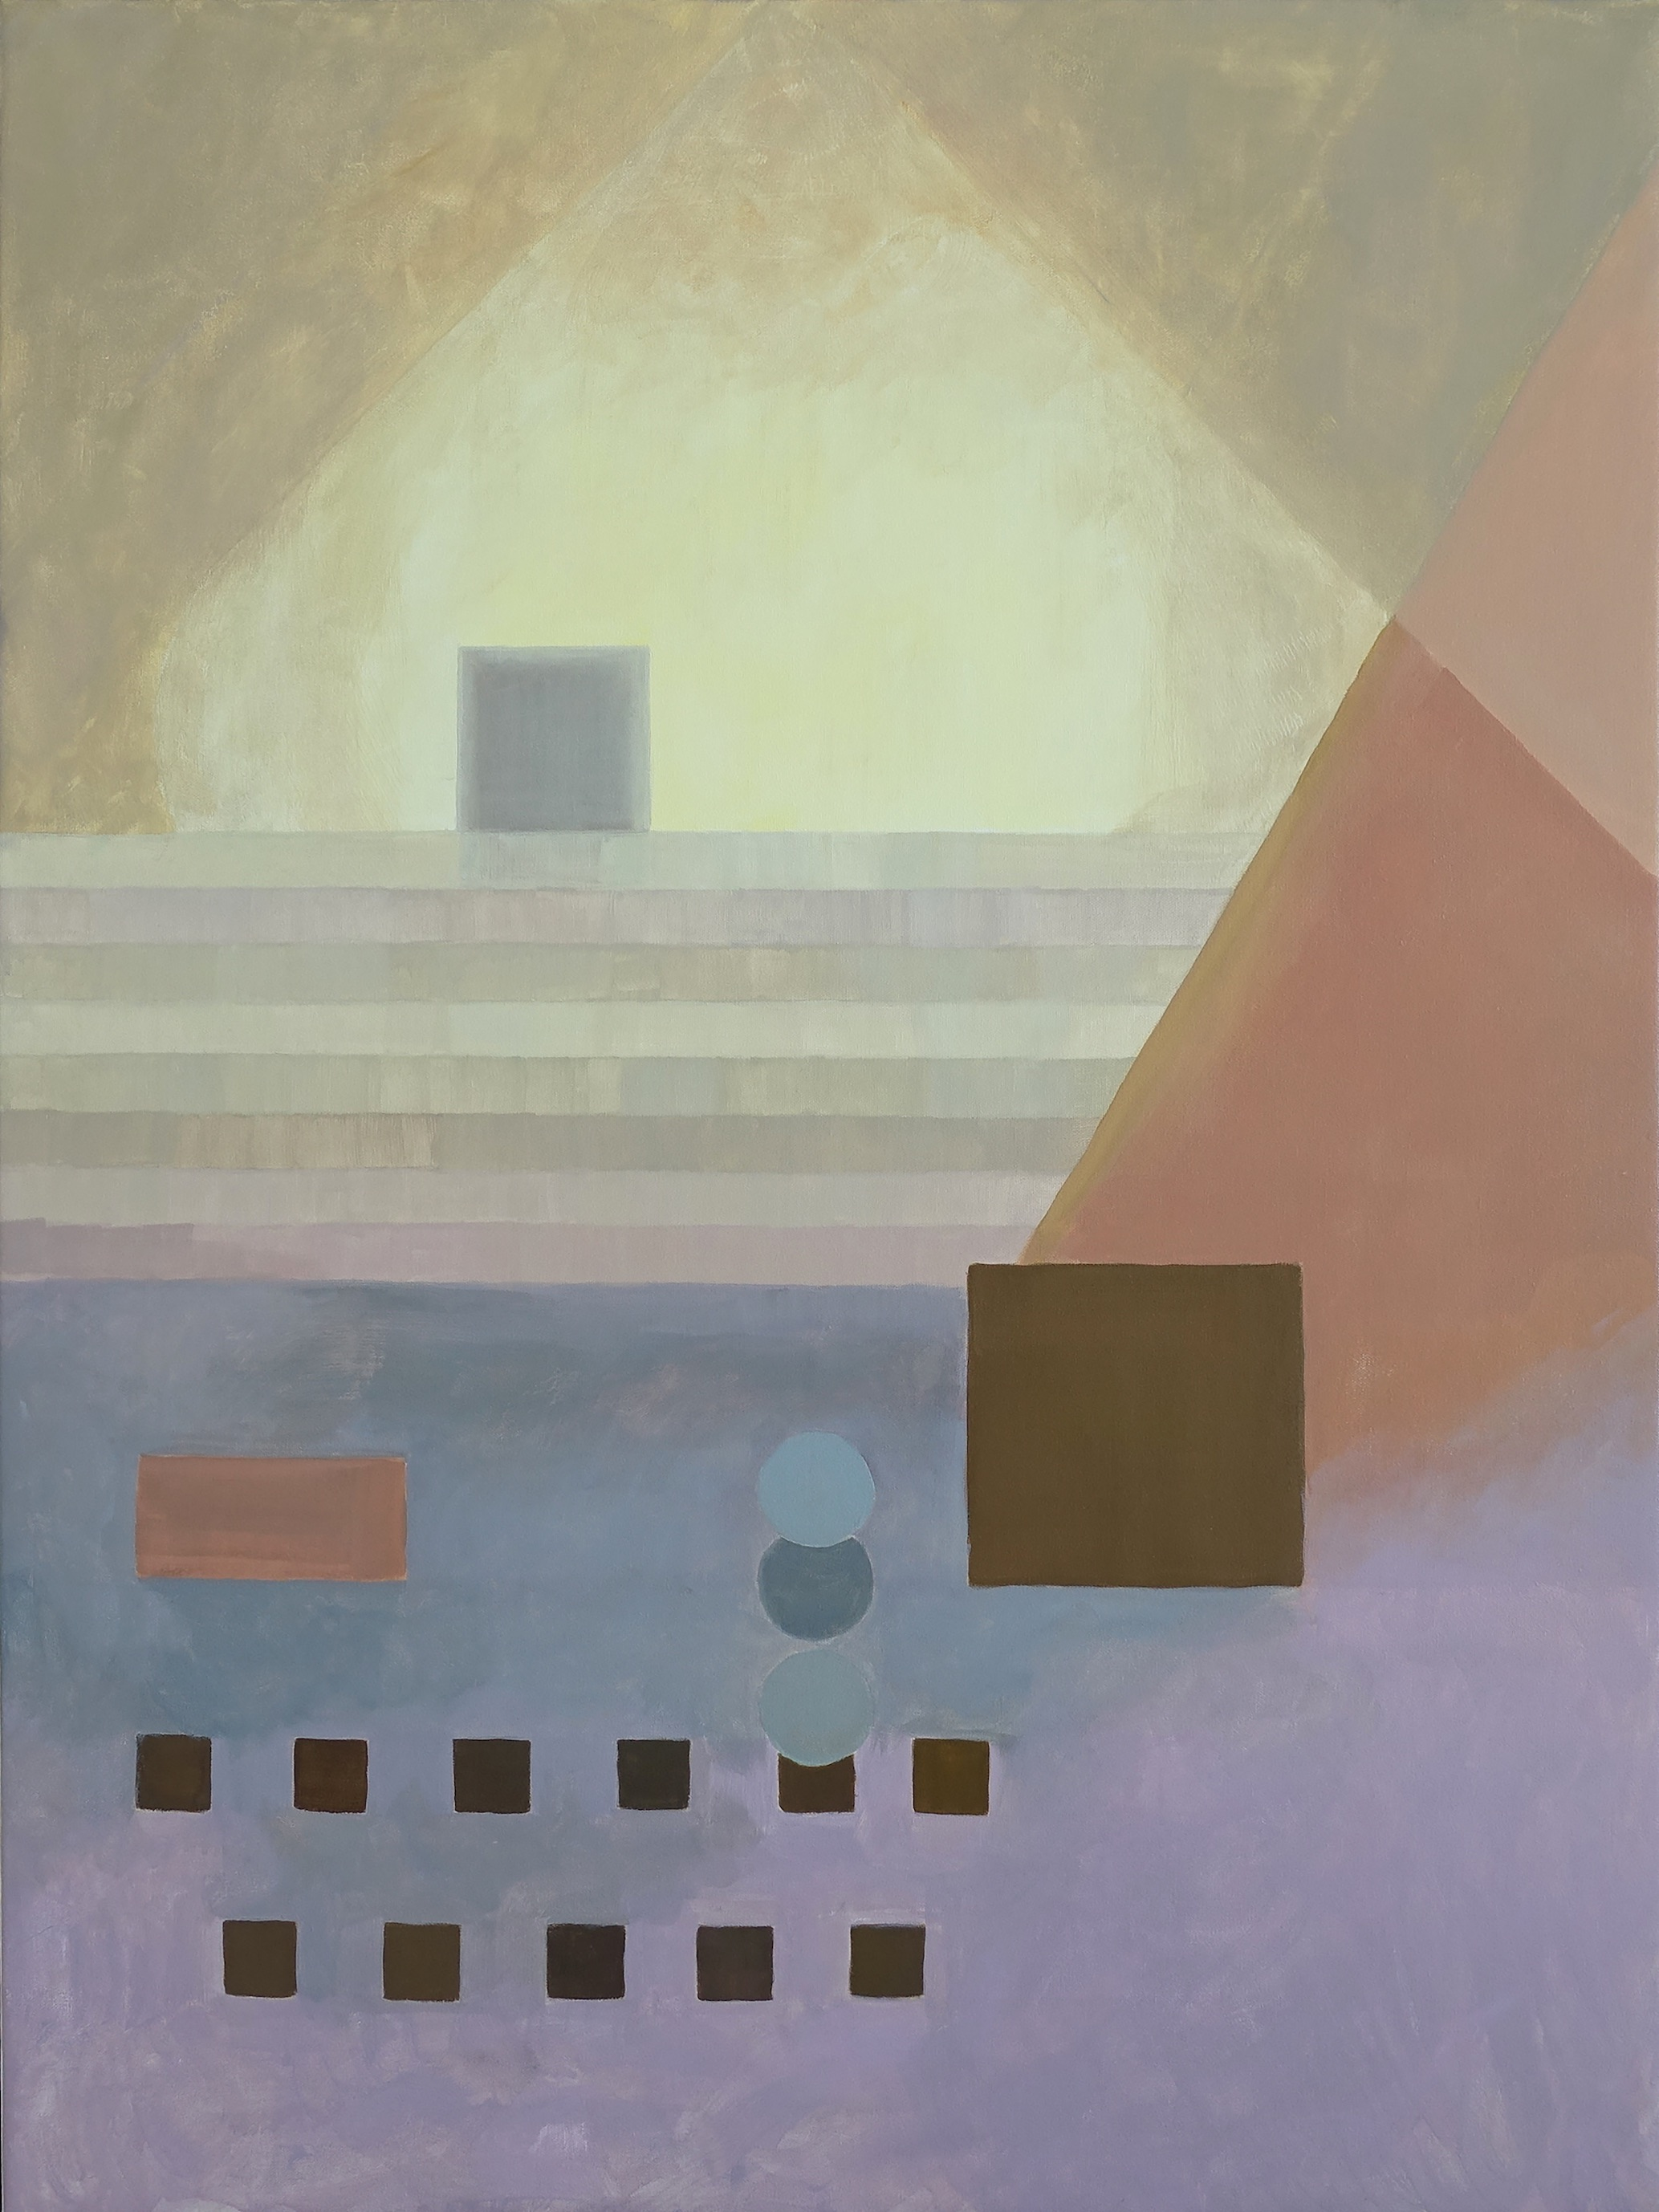 Untitled (Twenty M - Twenty D revisited), (2018)